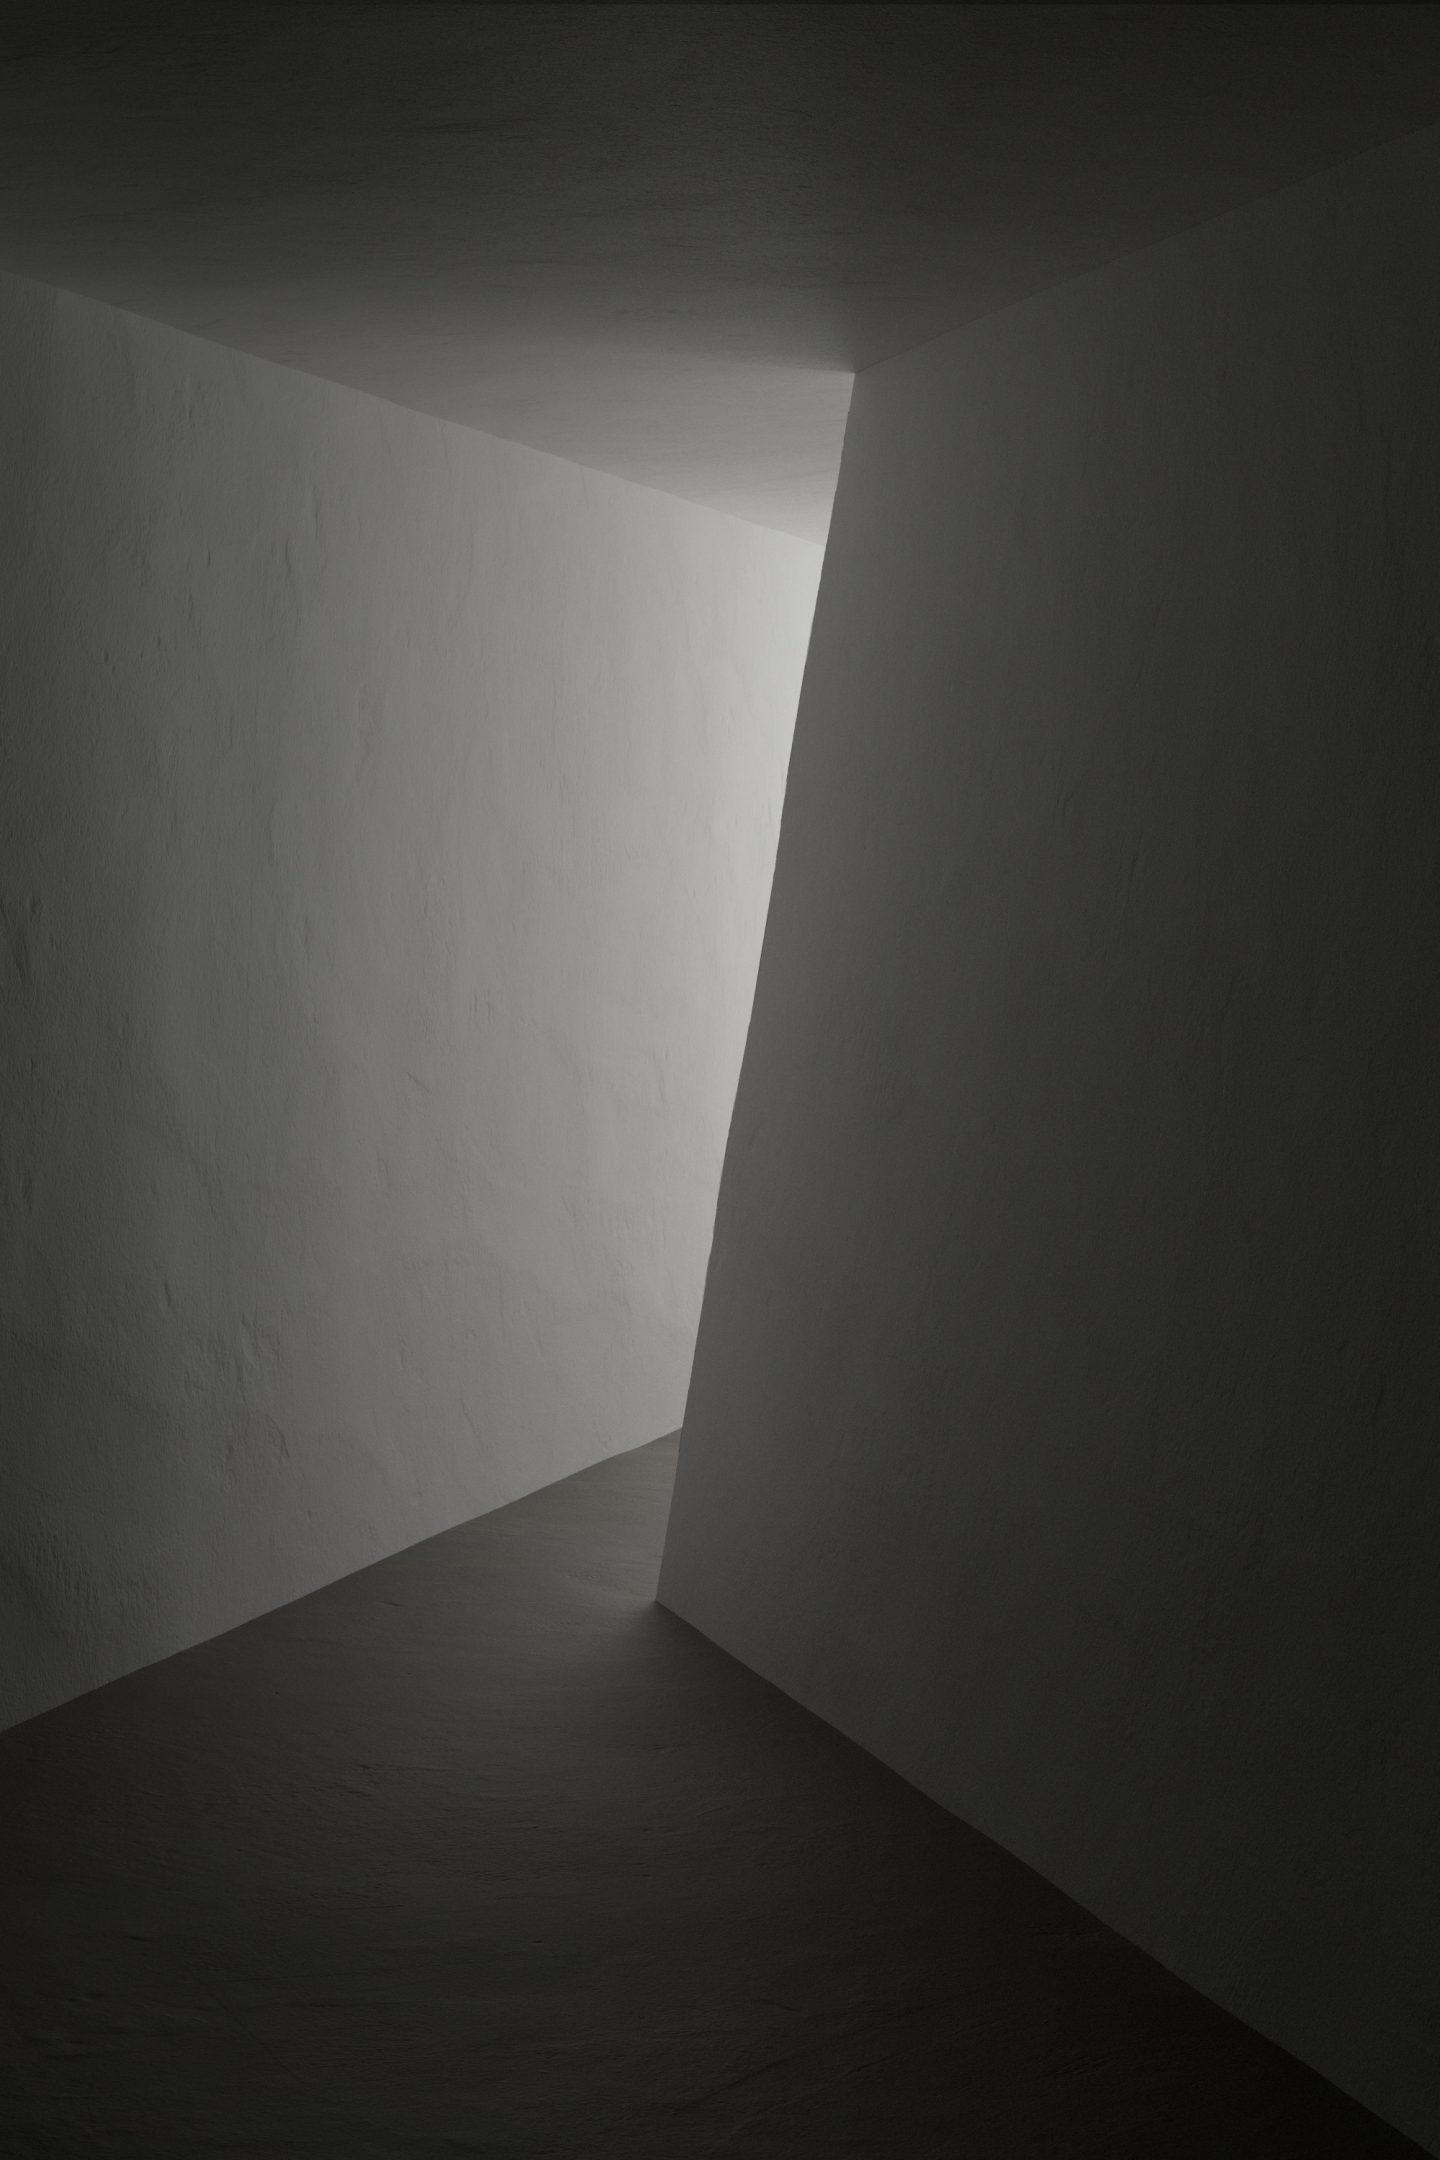 IGNANT-Art-Digital-Taupe-Chiaroscuro-6